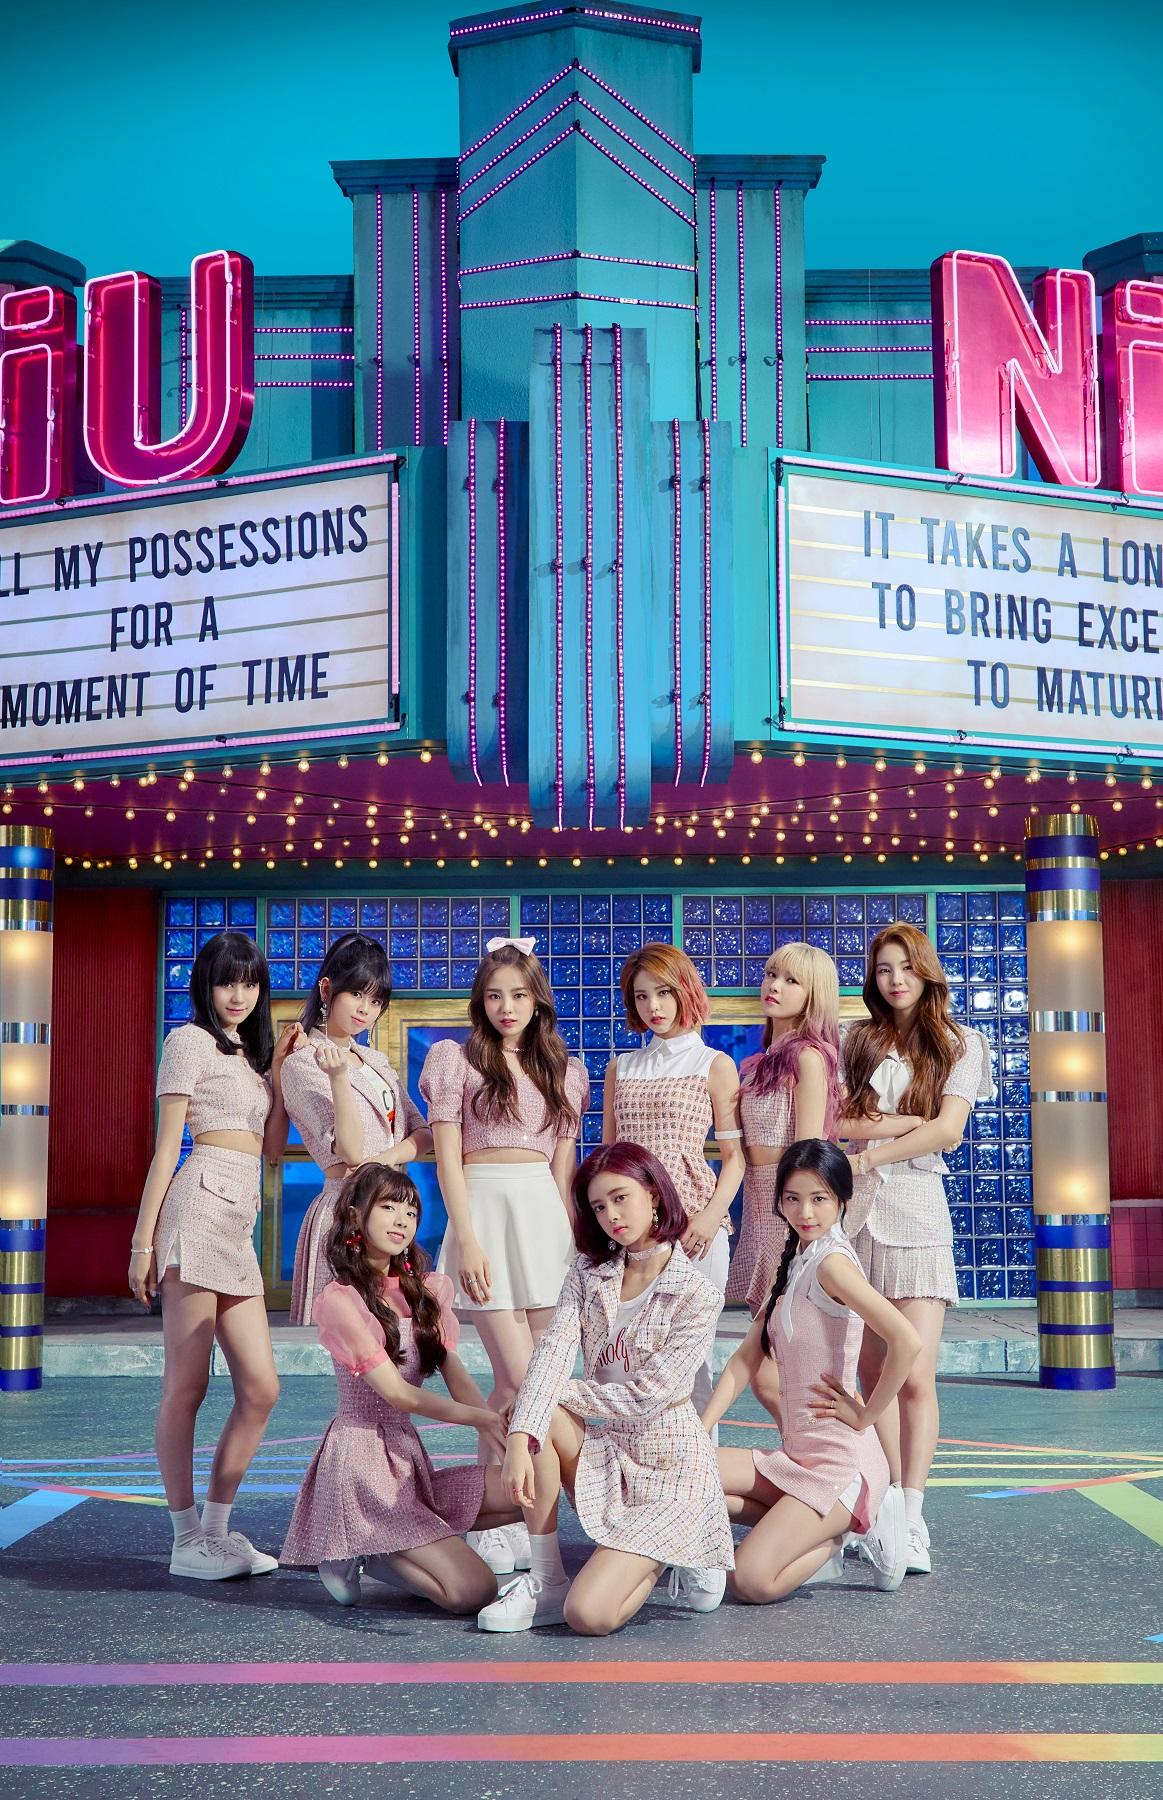 NiziUのデビューメンバー。前列左からミイヒ、リマ、マヤ。後列左からニナ、リク、リオ、マコ、マユカ、アヤカ